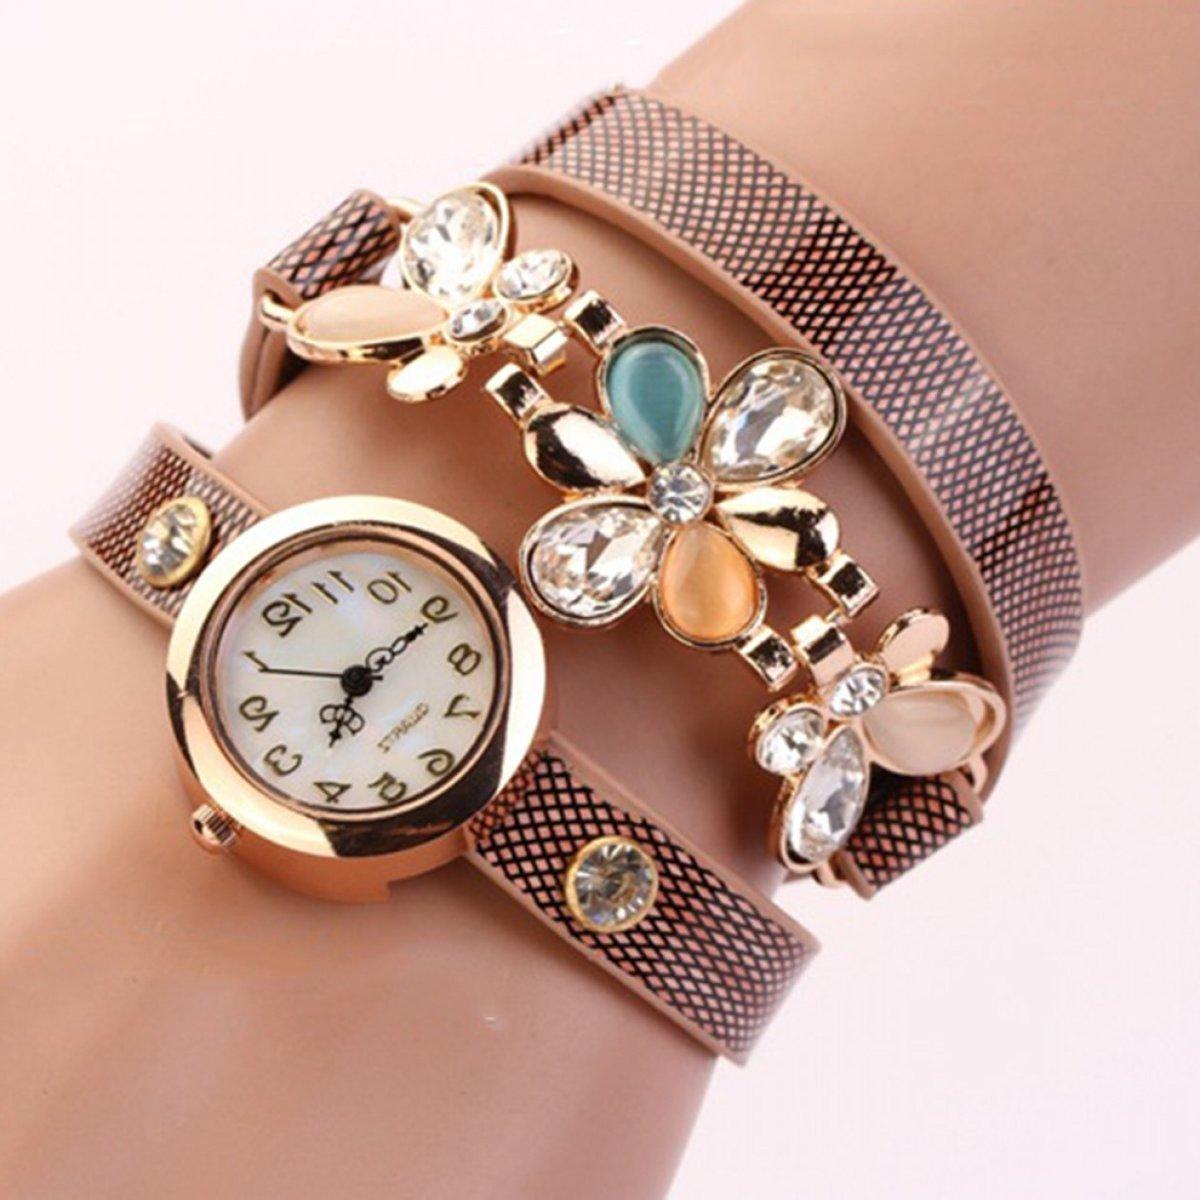 доктор картинки часы браслеты брюнетка всегда